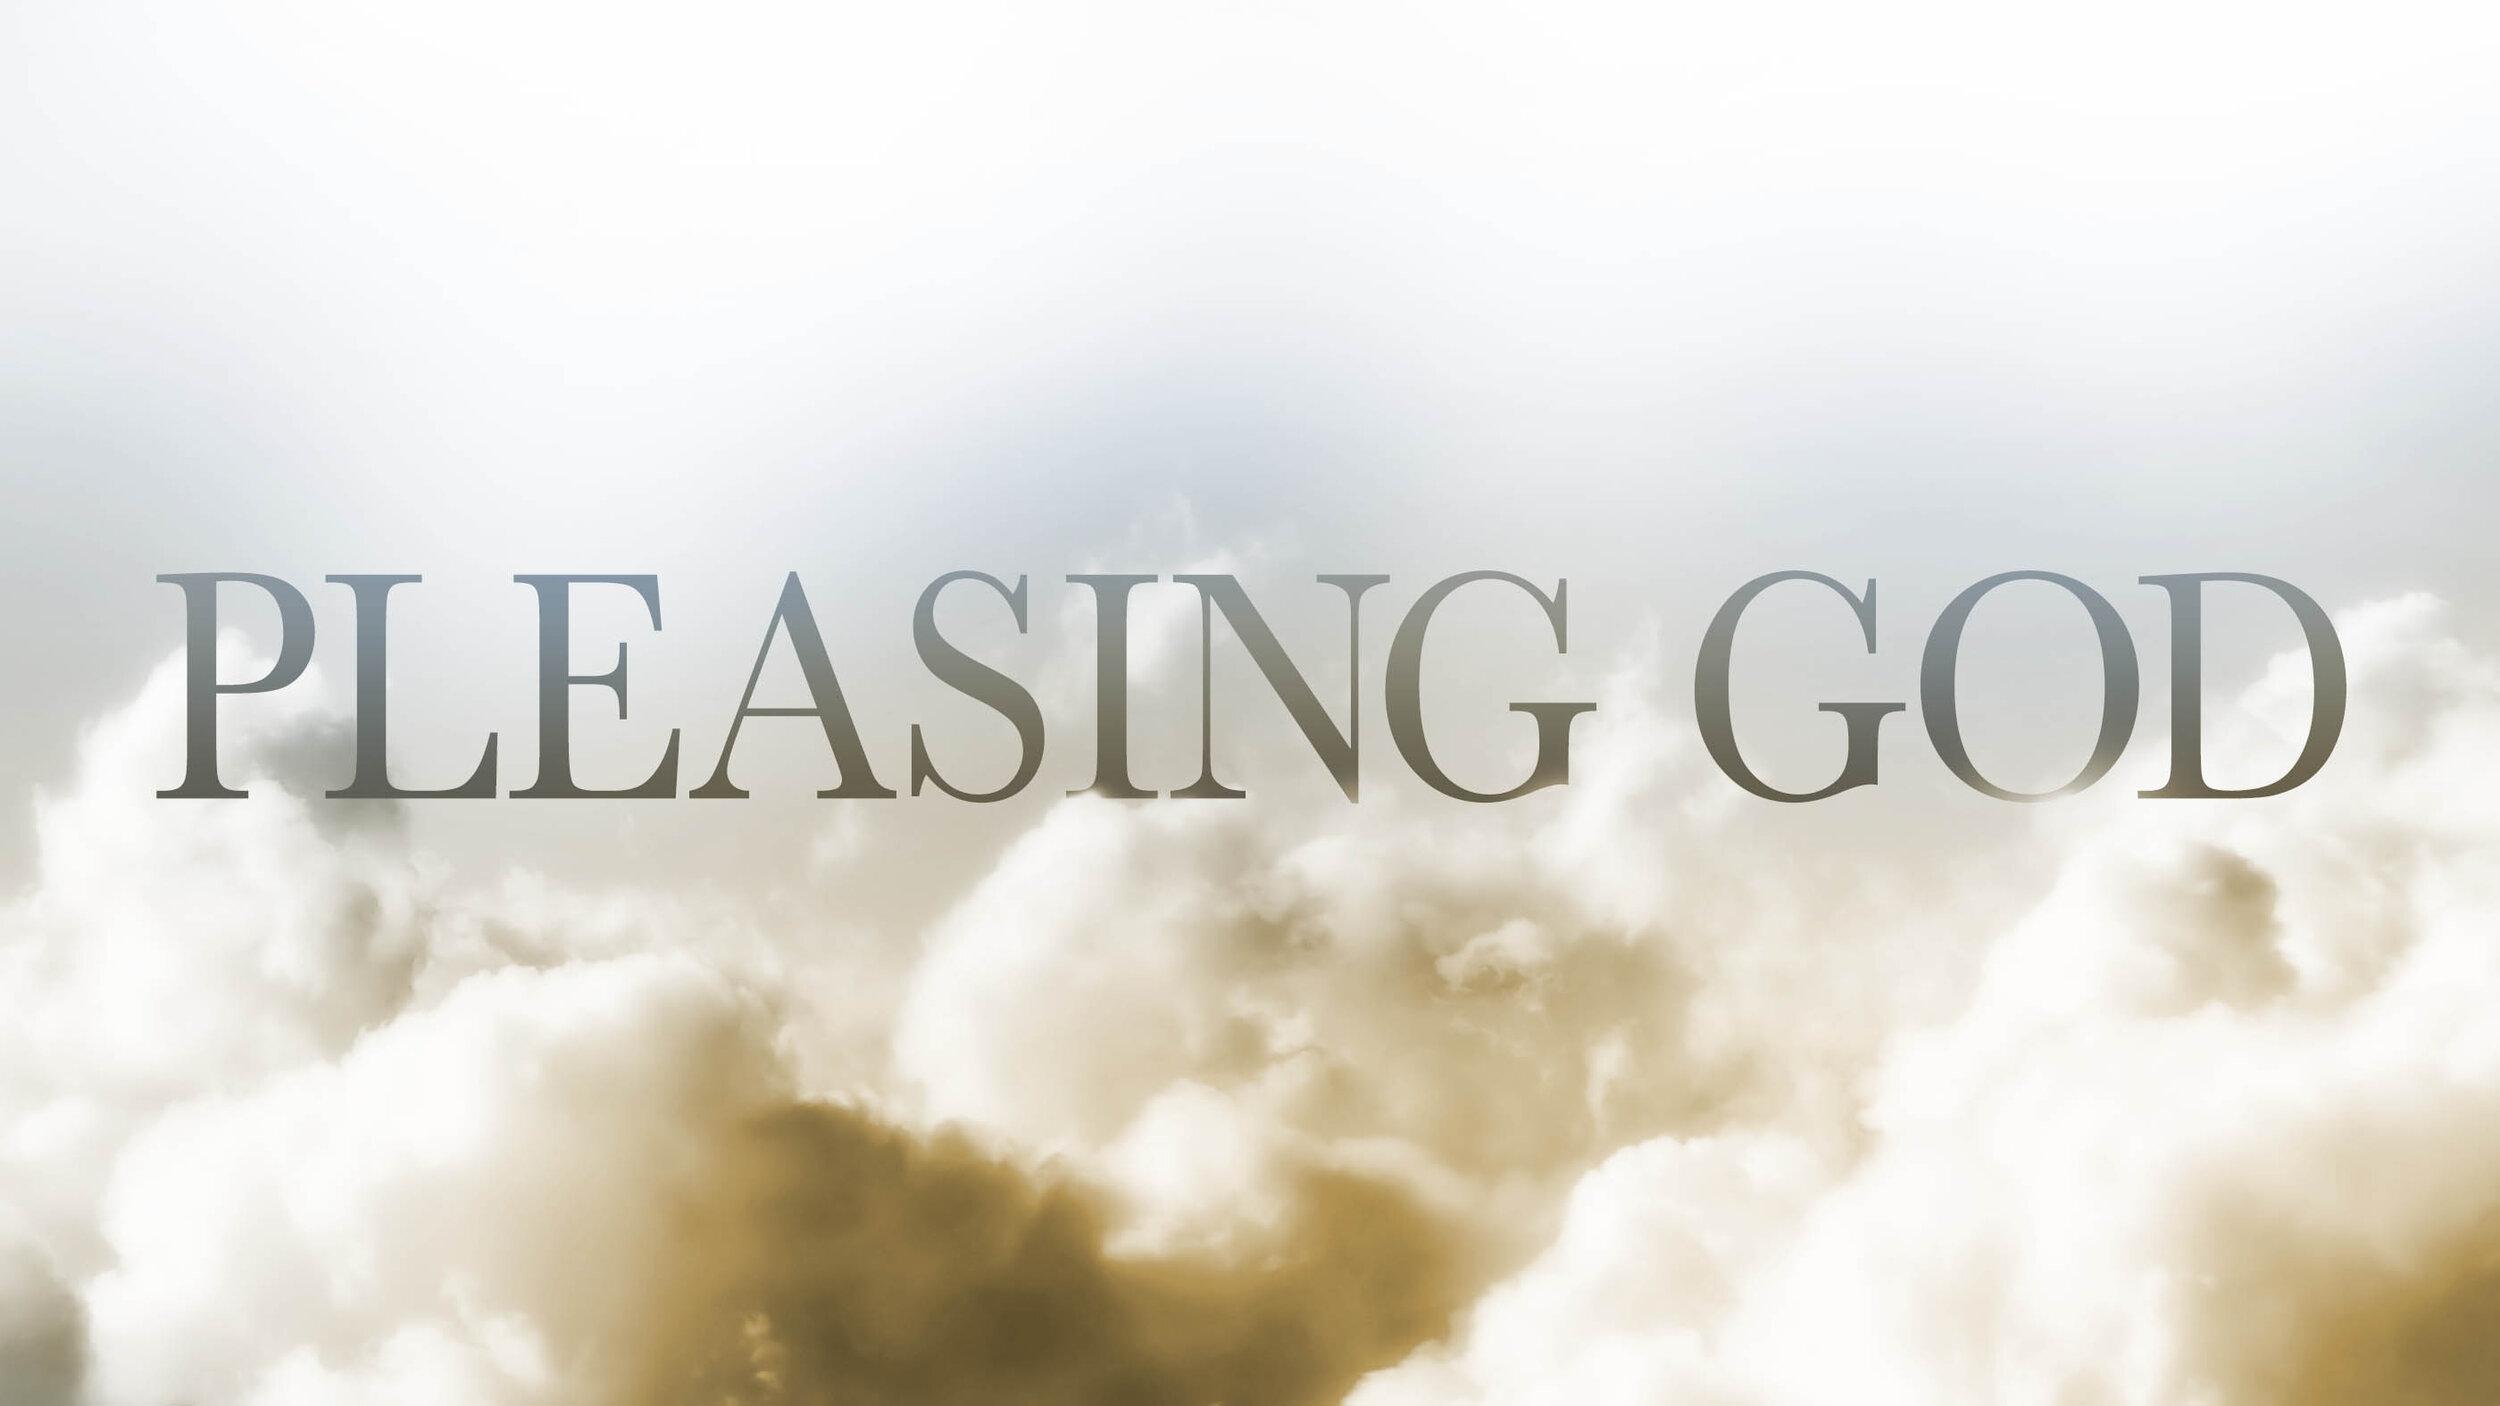 Pleasing God Ttl.jpg